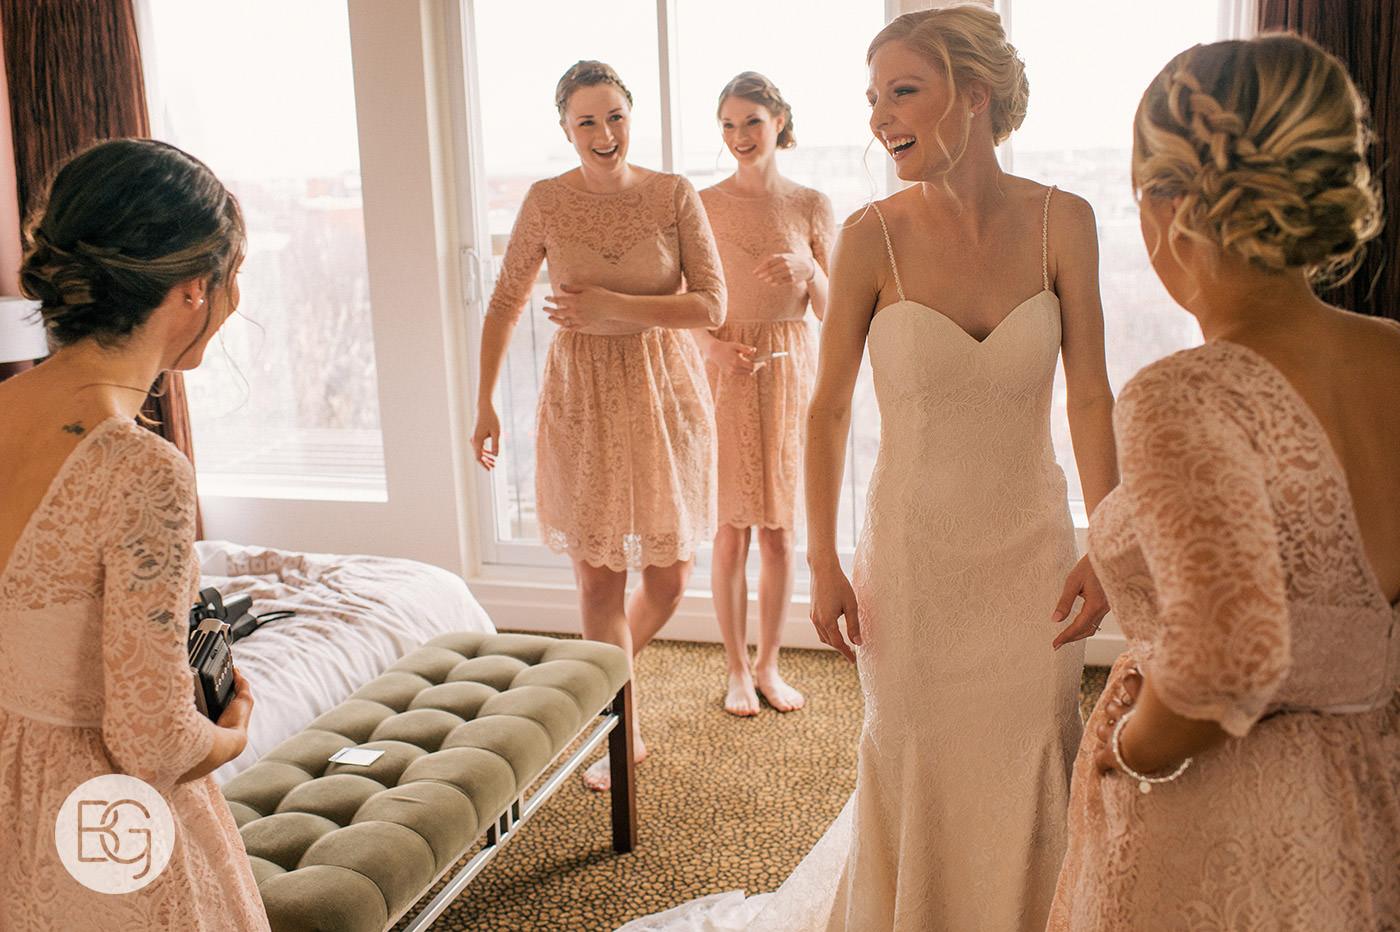 Edmonton_wedding_photographers_josh_sara_whyte_08.jpg